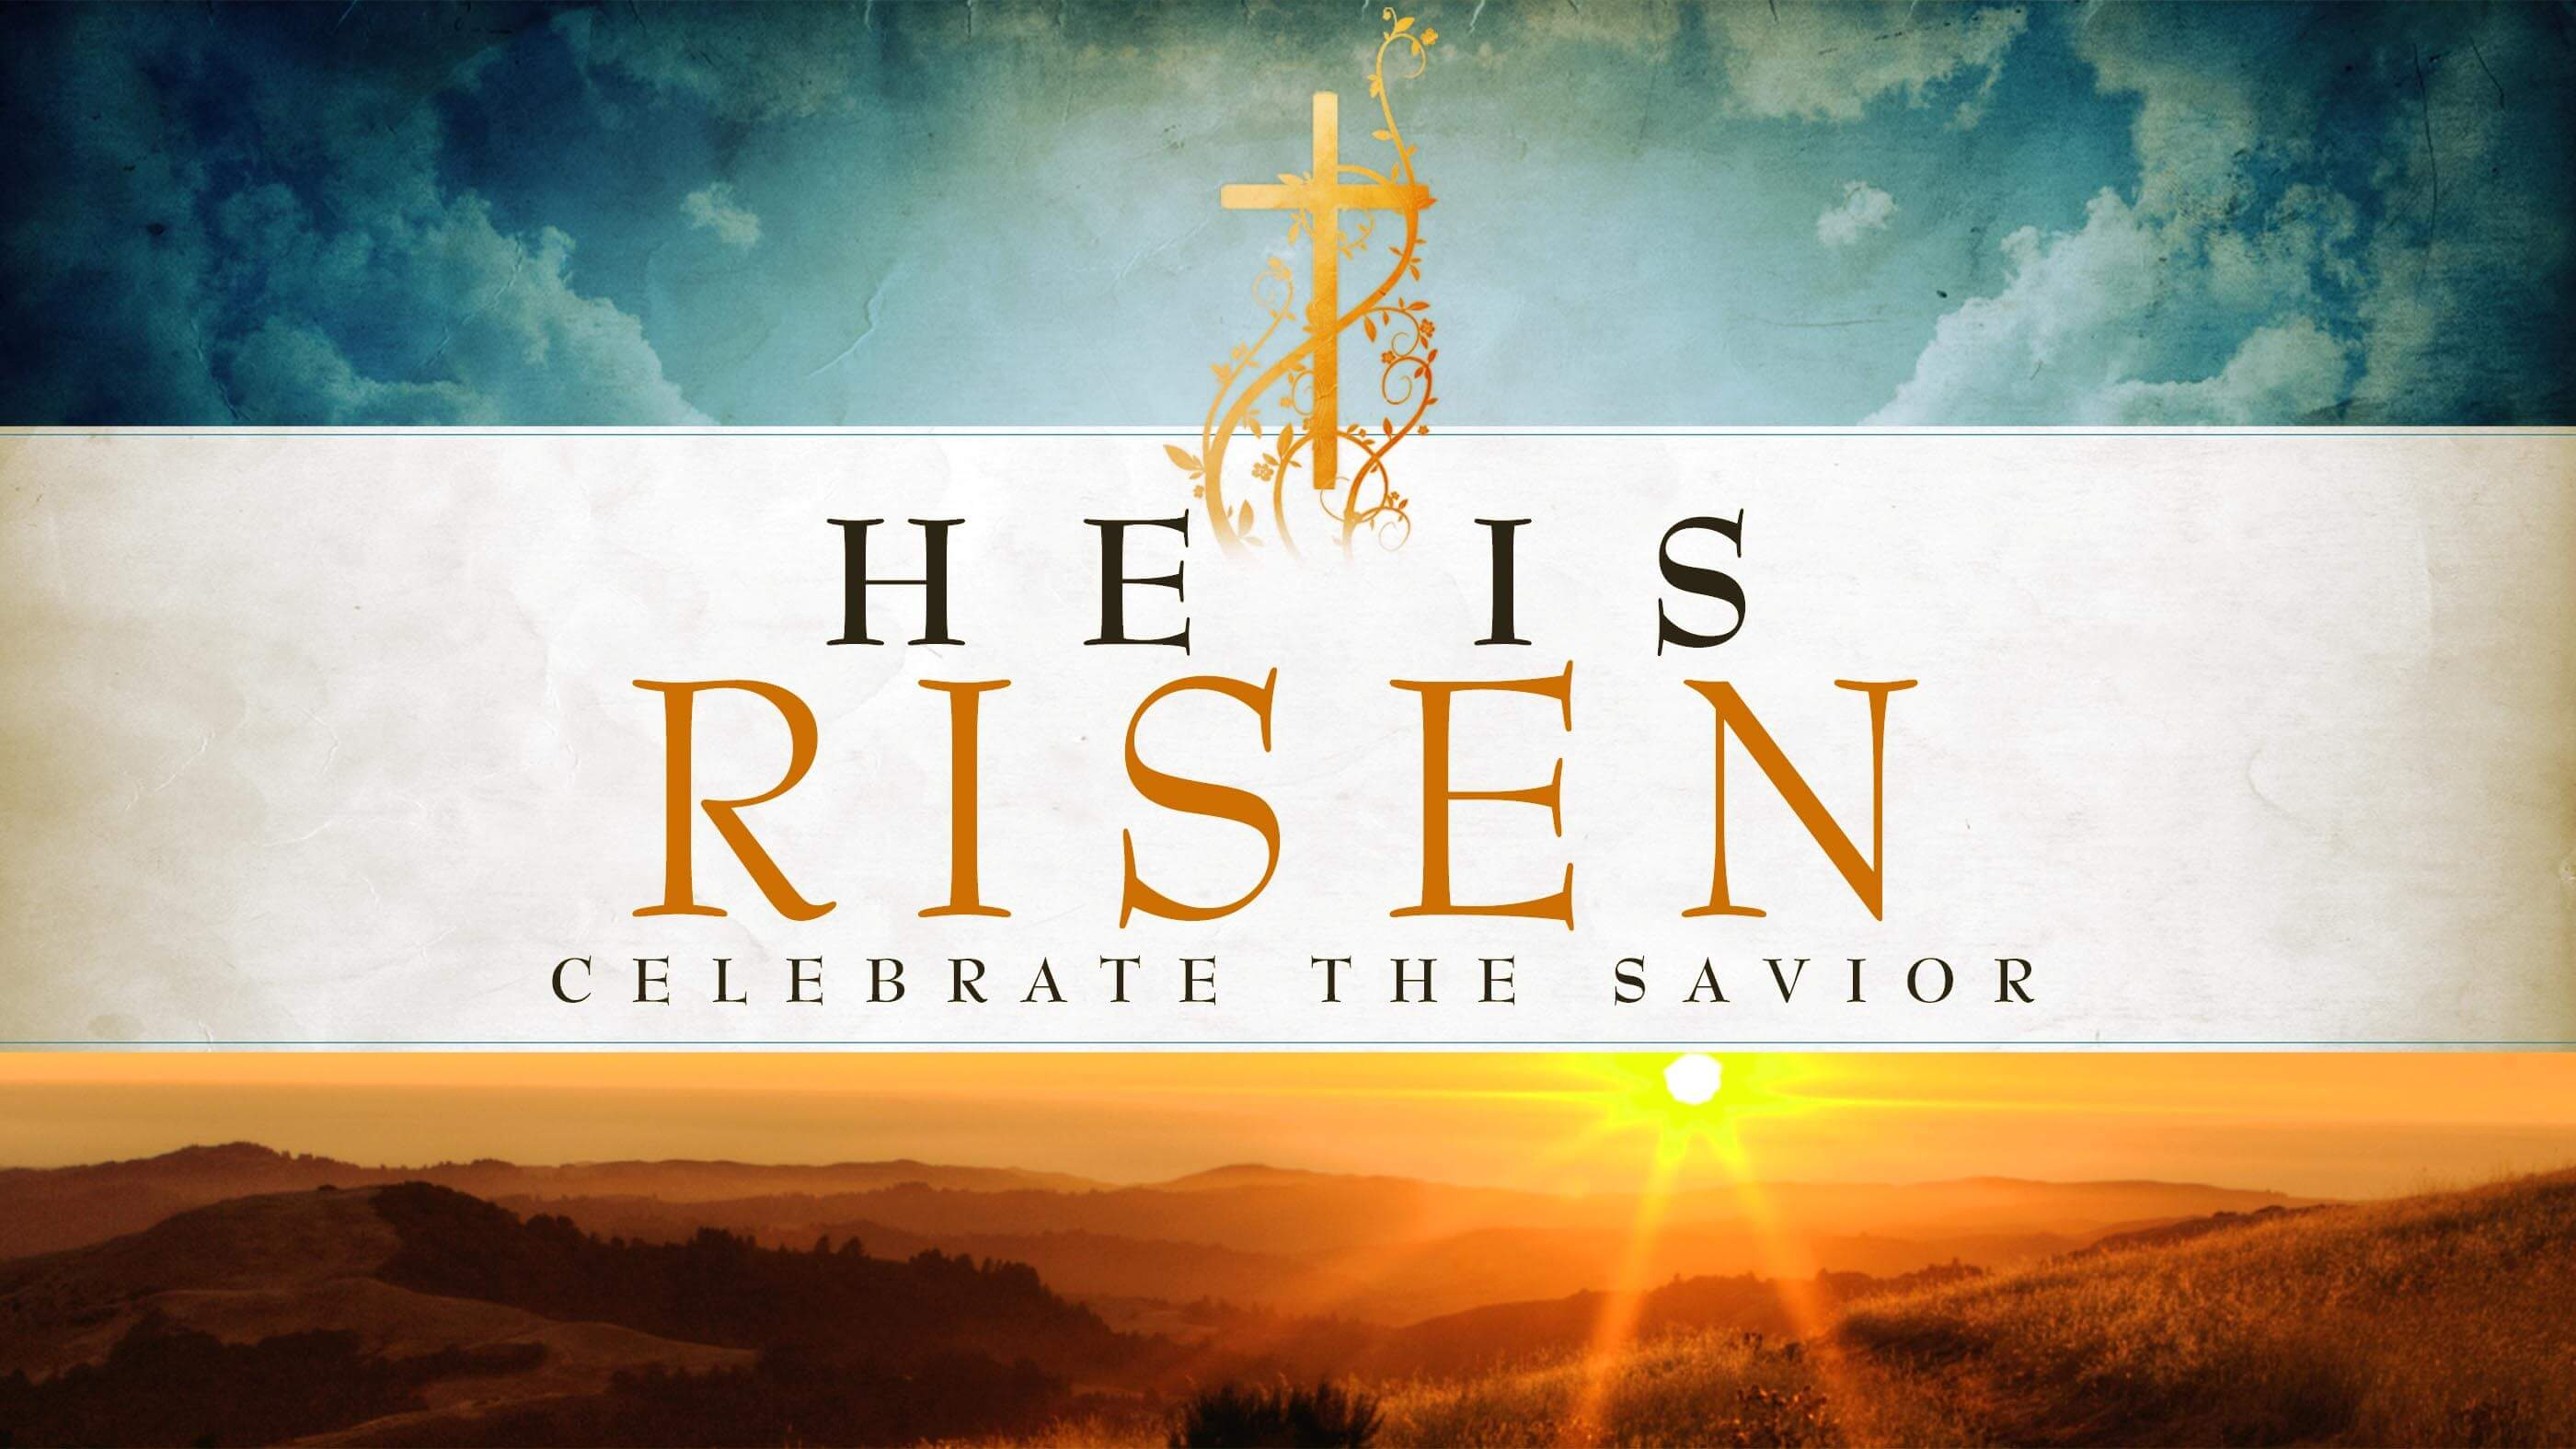 happy easter jesus resurrection risen hd wallpaper desktop